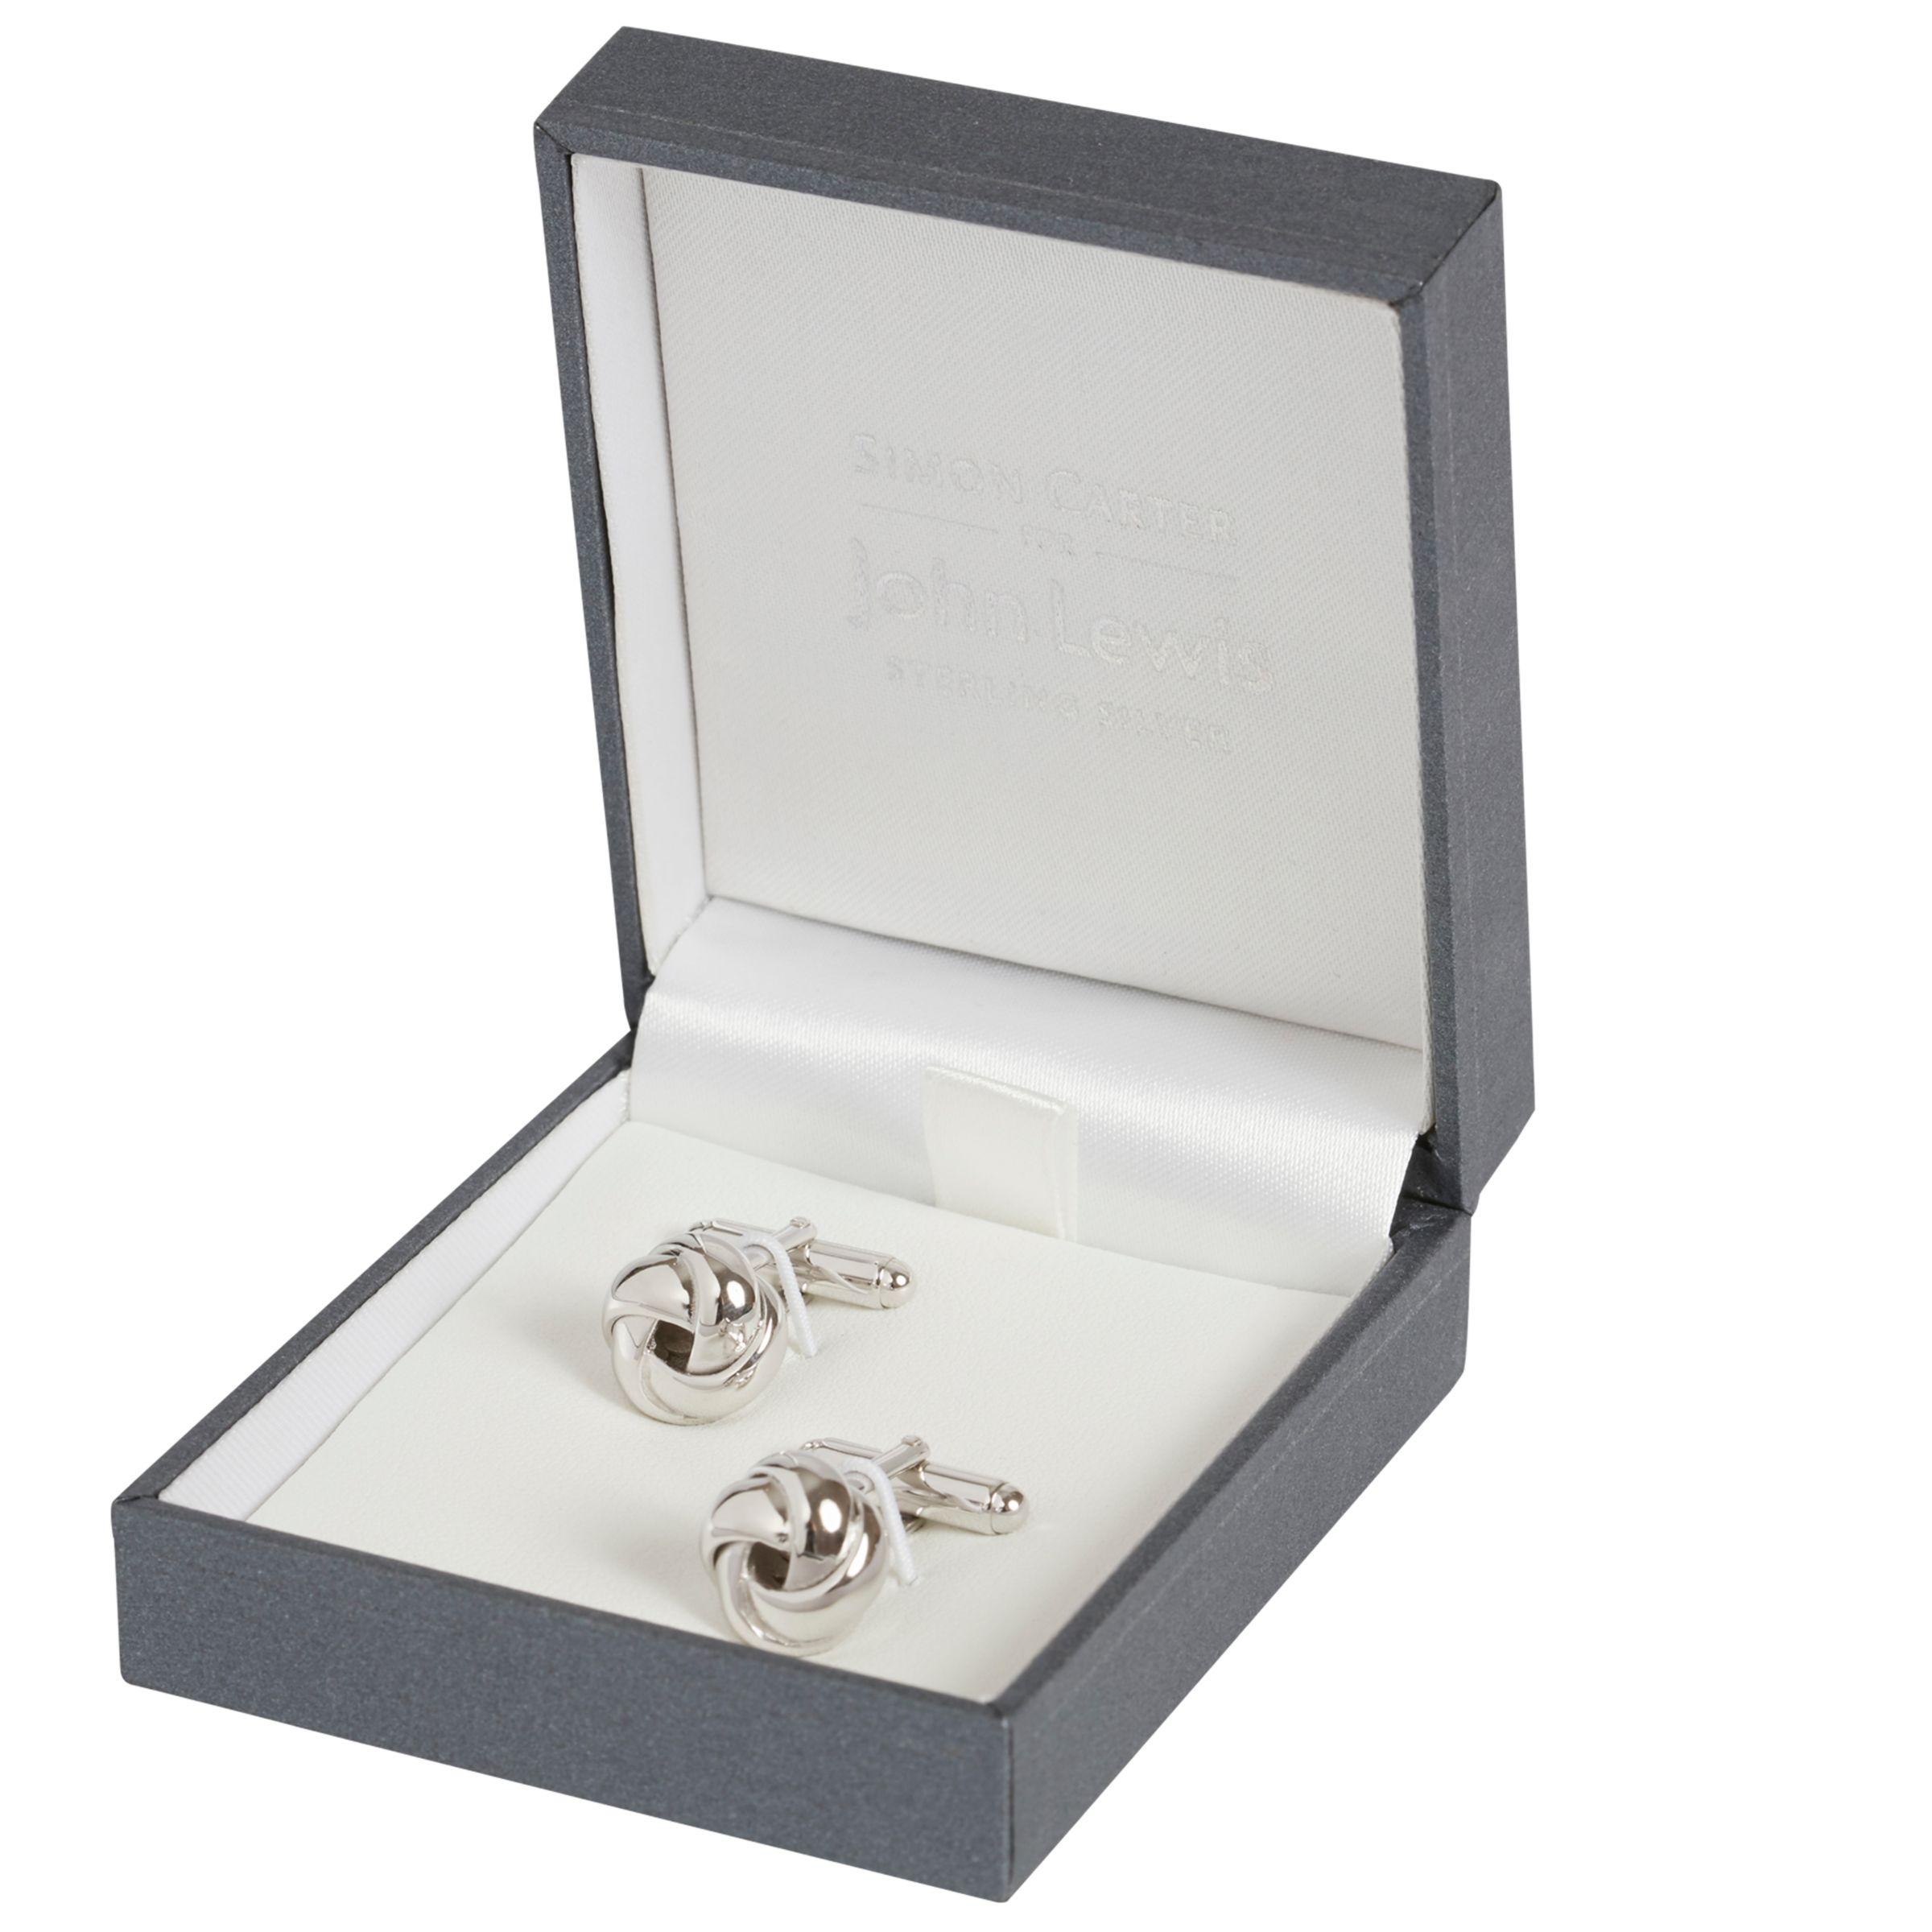 Simon Carter Simon Carter for John Lewis Sterling Silver Knot Cufflinks, Silver